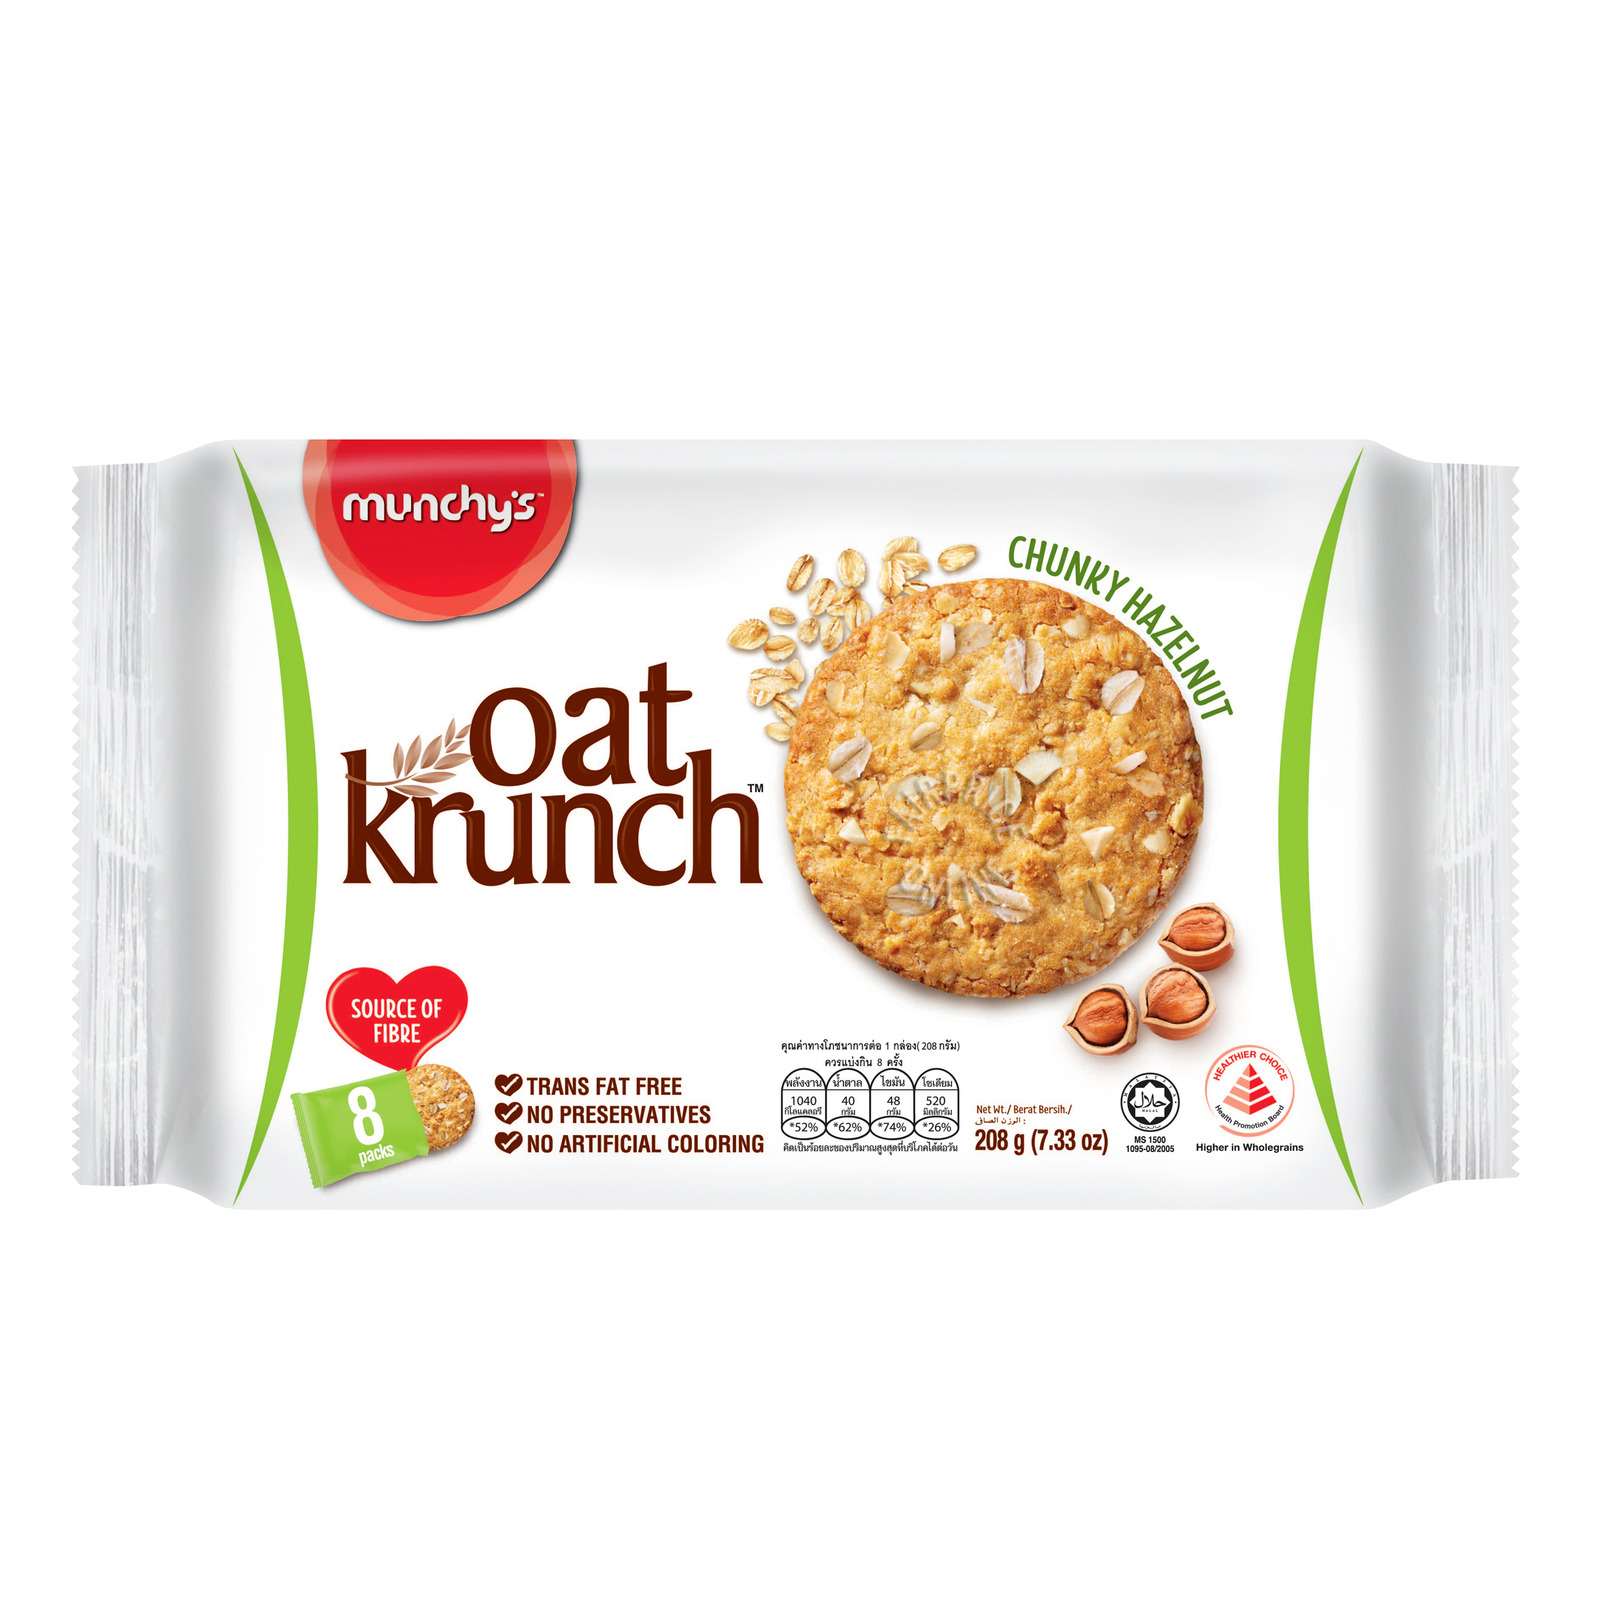 Munchy's Oat Krunch Crackers - Chunky Hazelnut